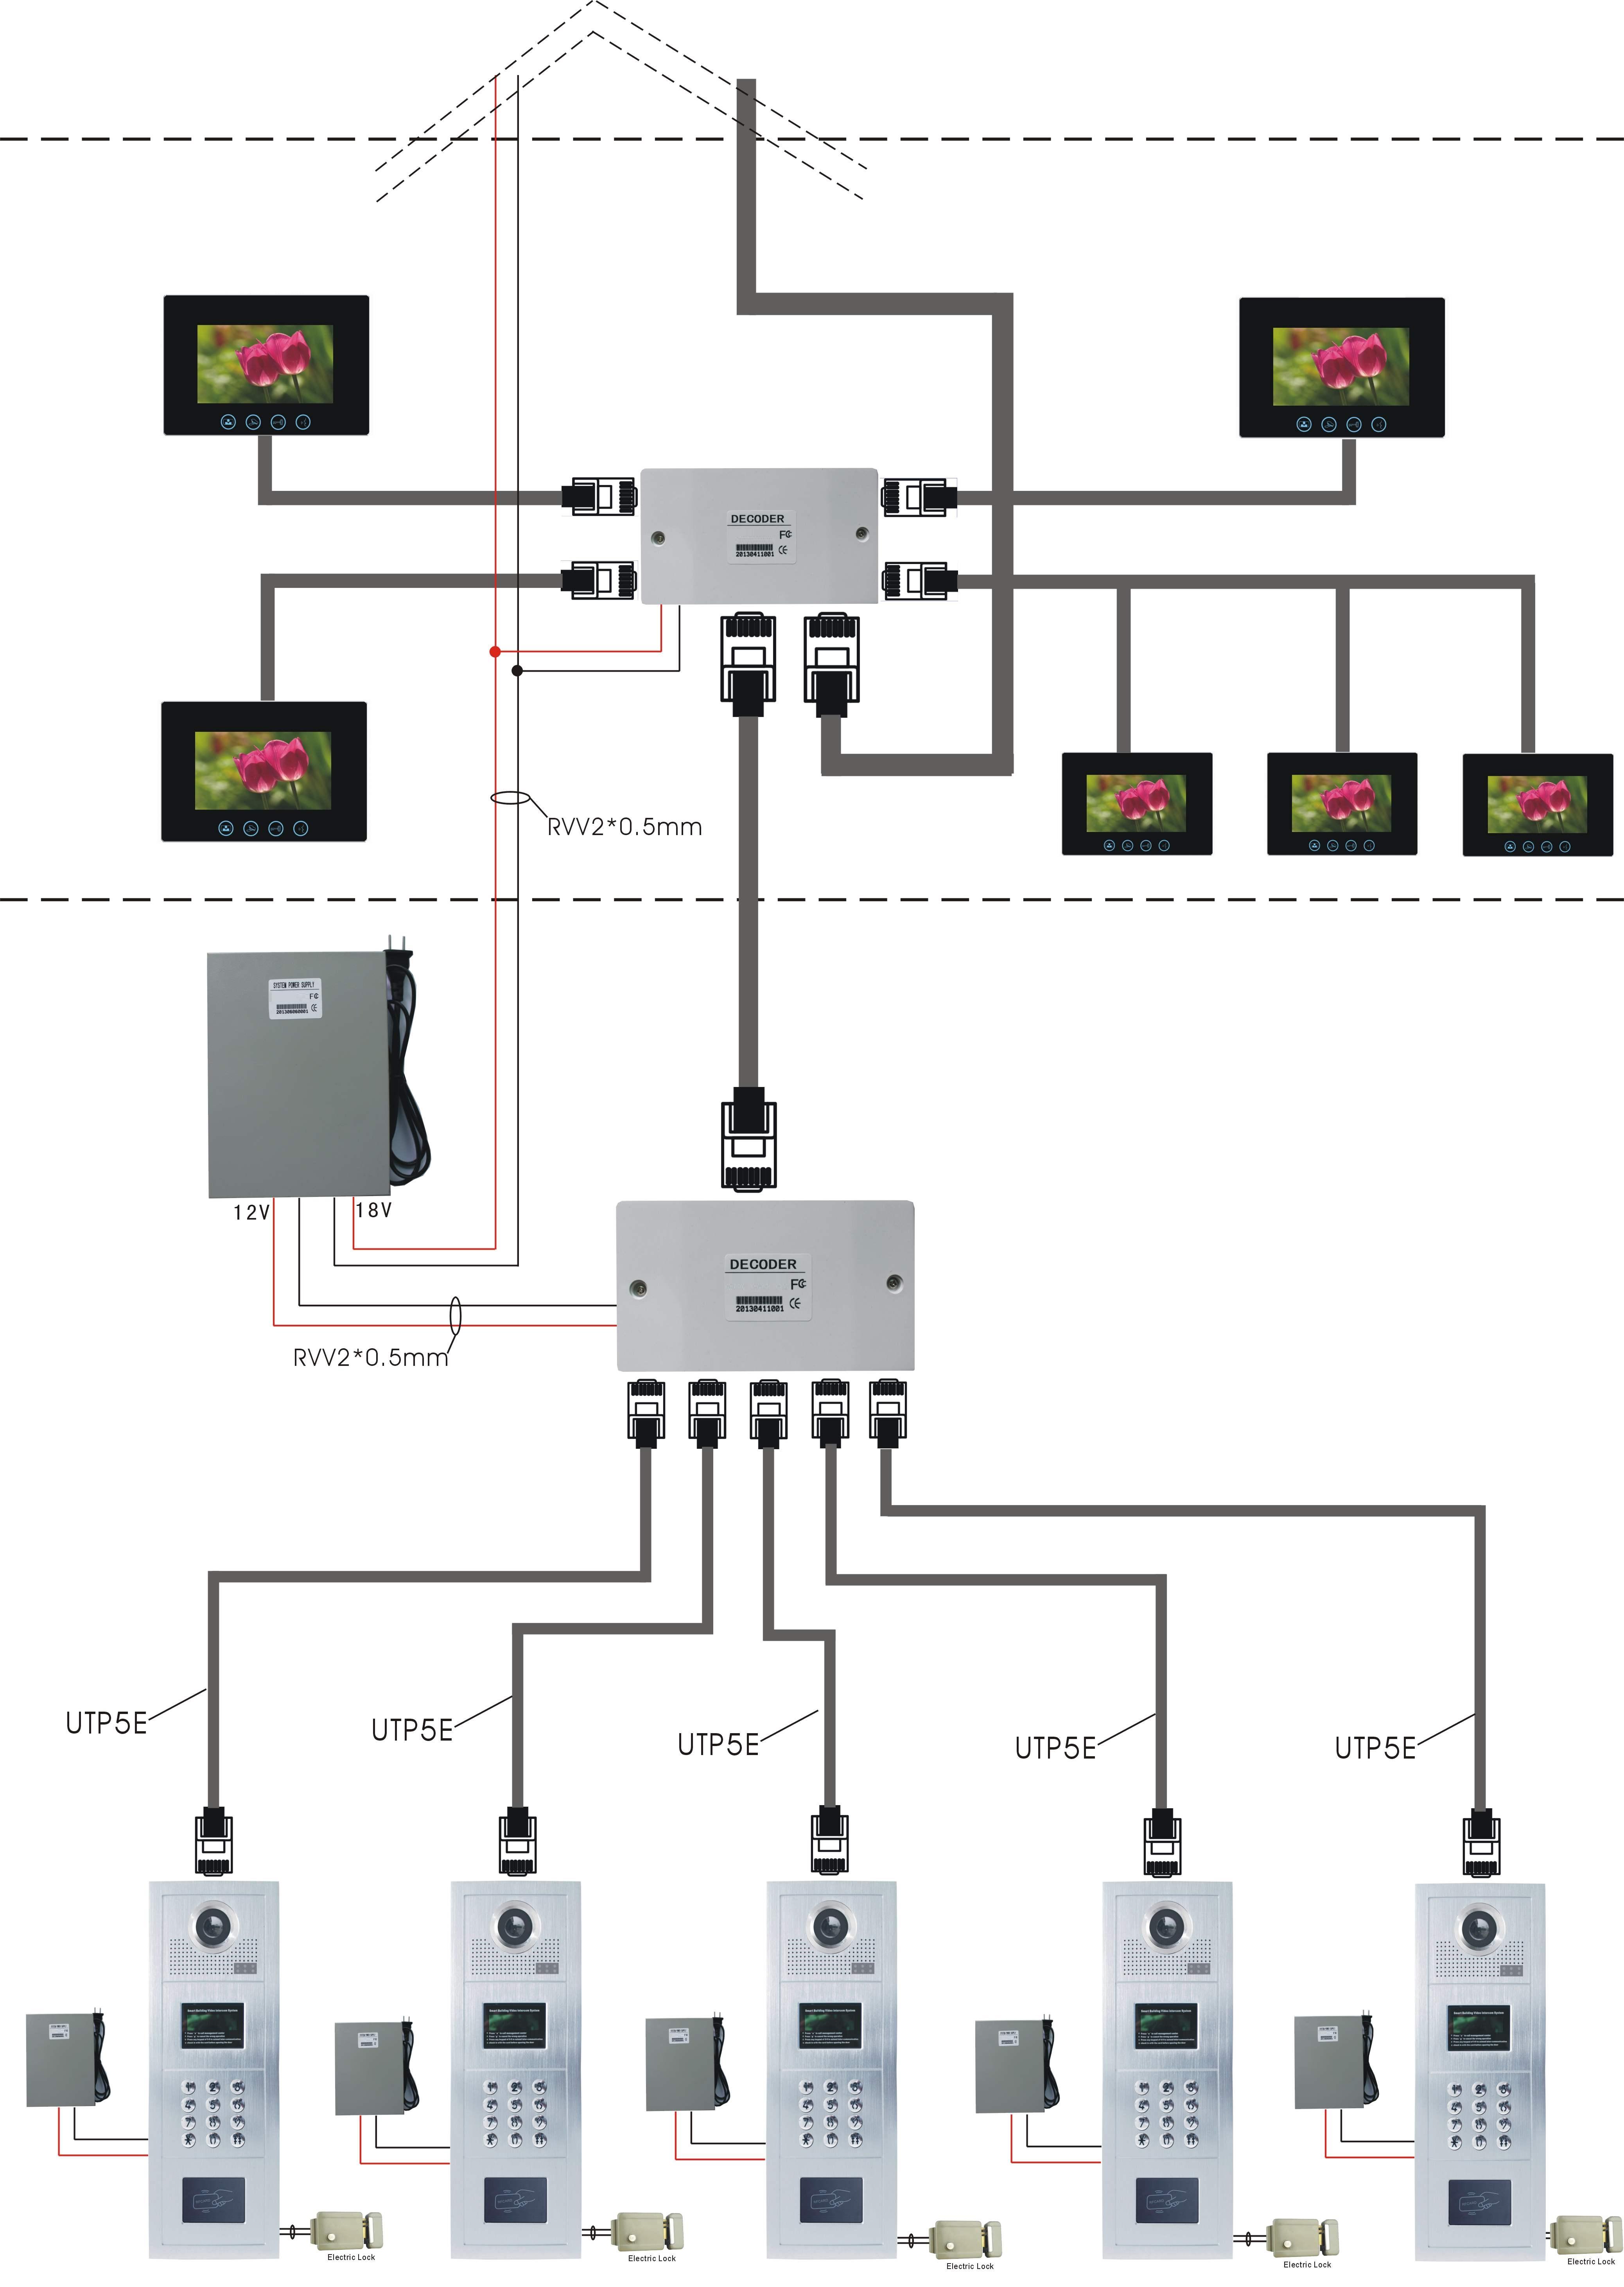 intercom wiring diagram, Wiring diagram